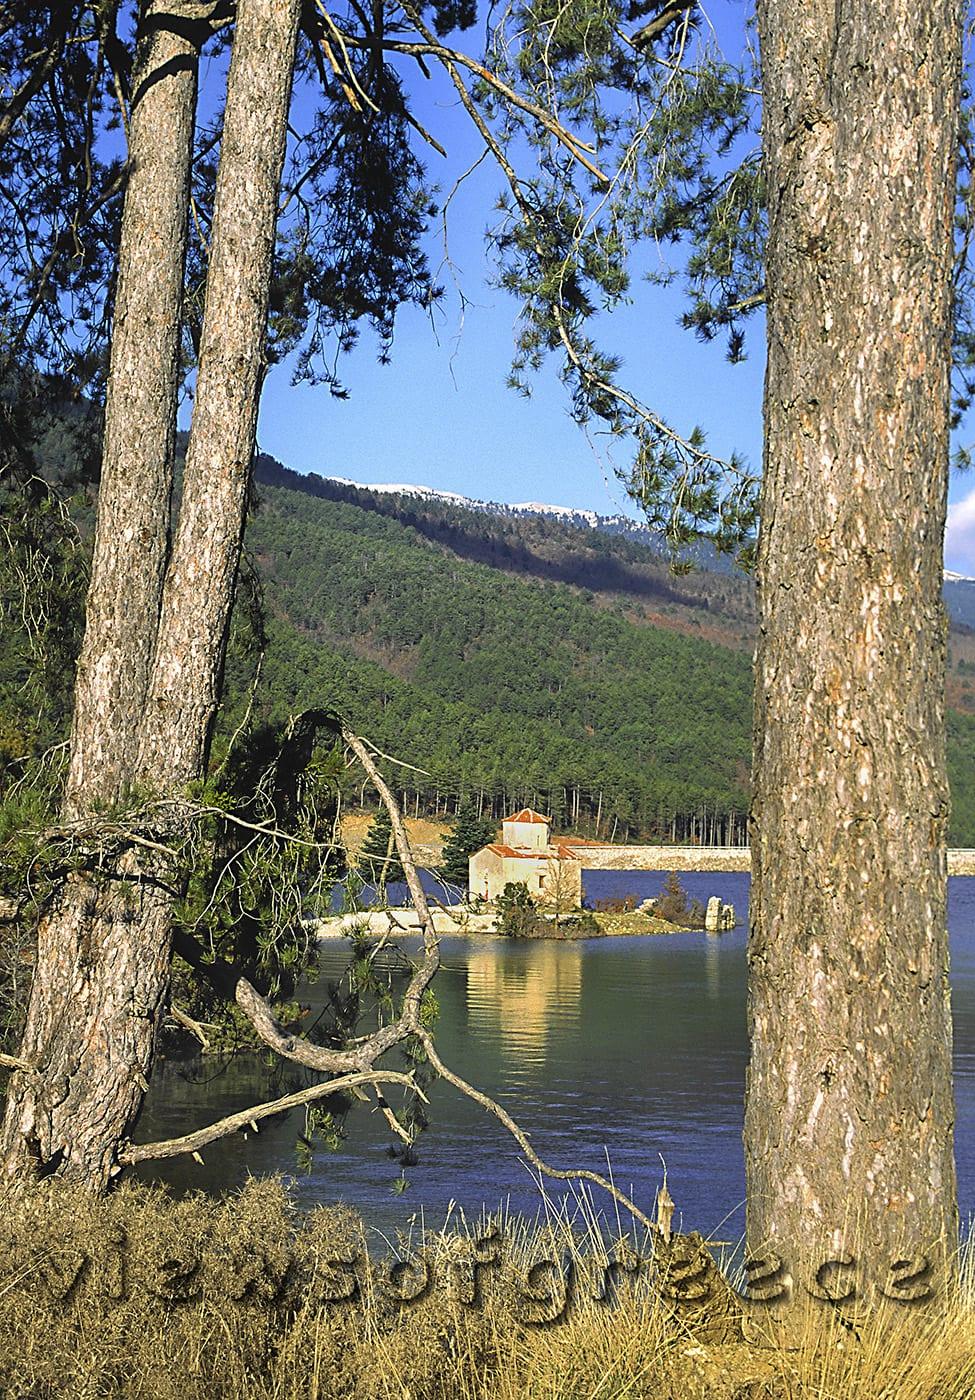 landscape, lake, greece, korinthia, feneos, peloponnese, mountain, lake doxa, reflection, lake feneos, outdoor, λίμνη Δόξα, Ορεινή Κορινθία, Γκούρα, Αρχαία Φενεός, Φθινόπωρο, Χειμώνας